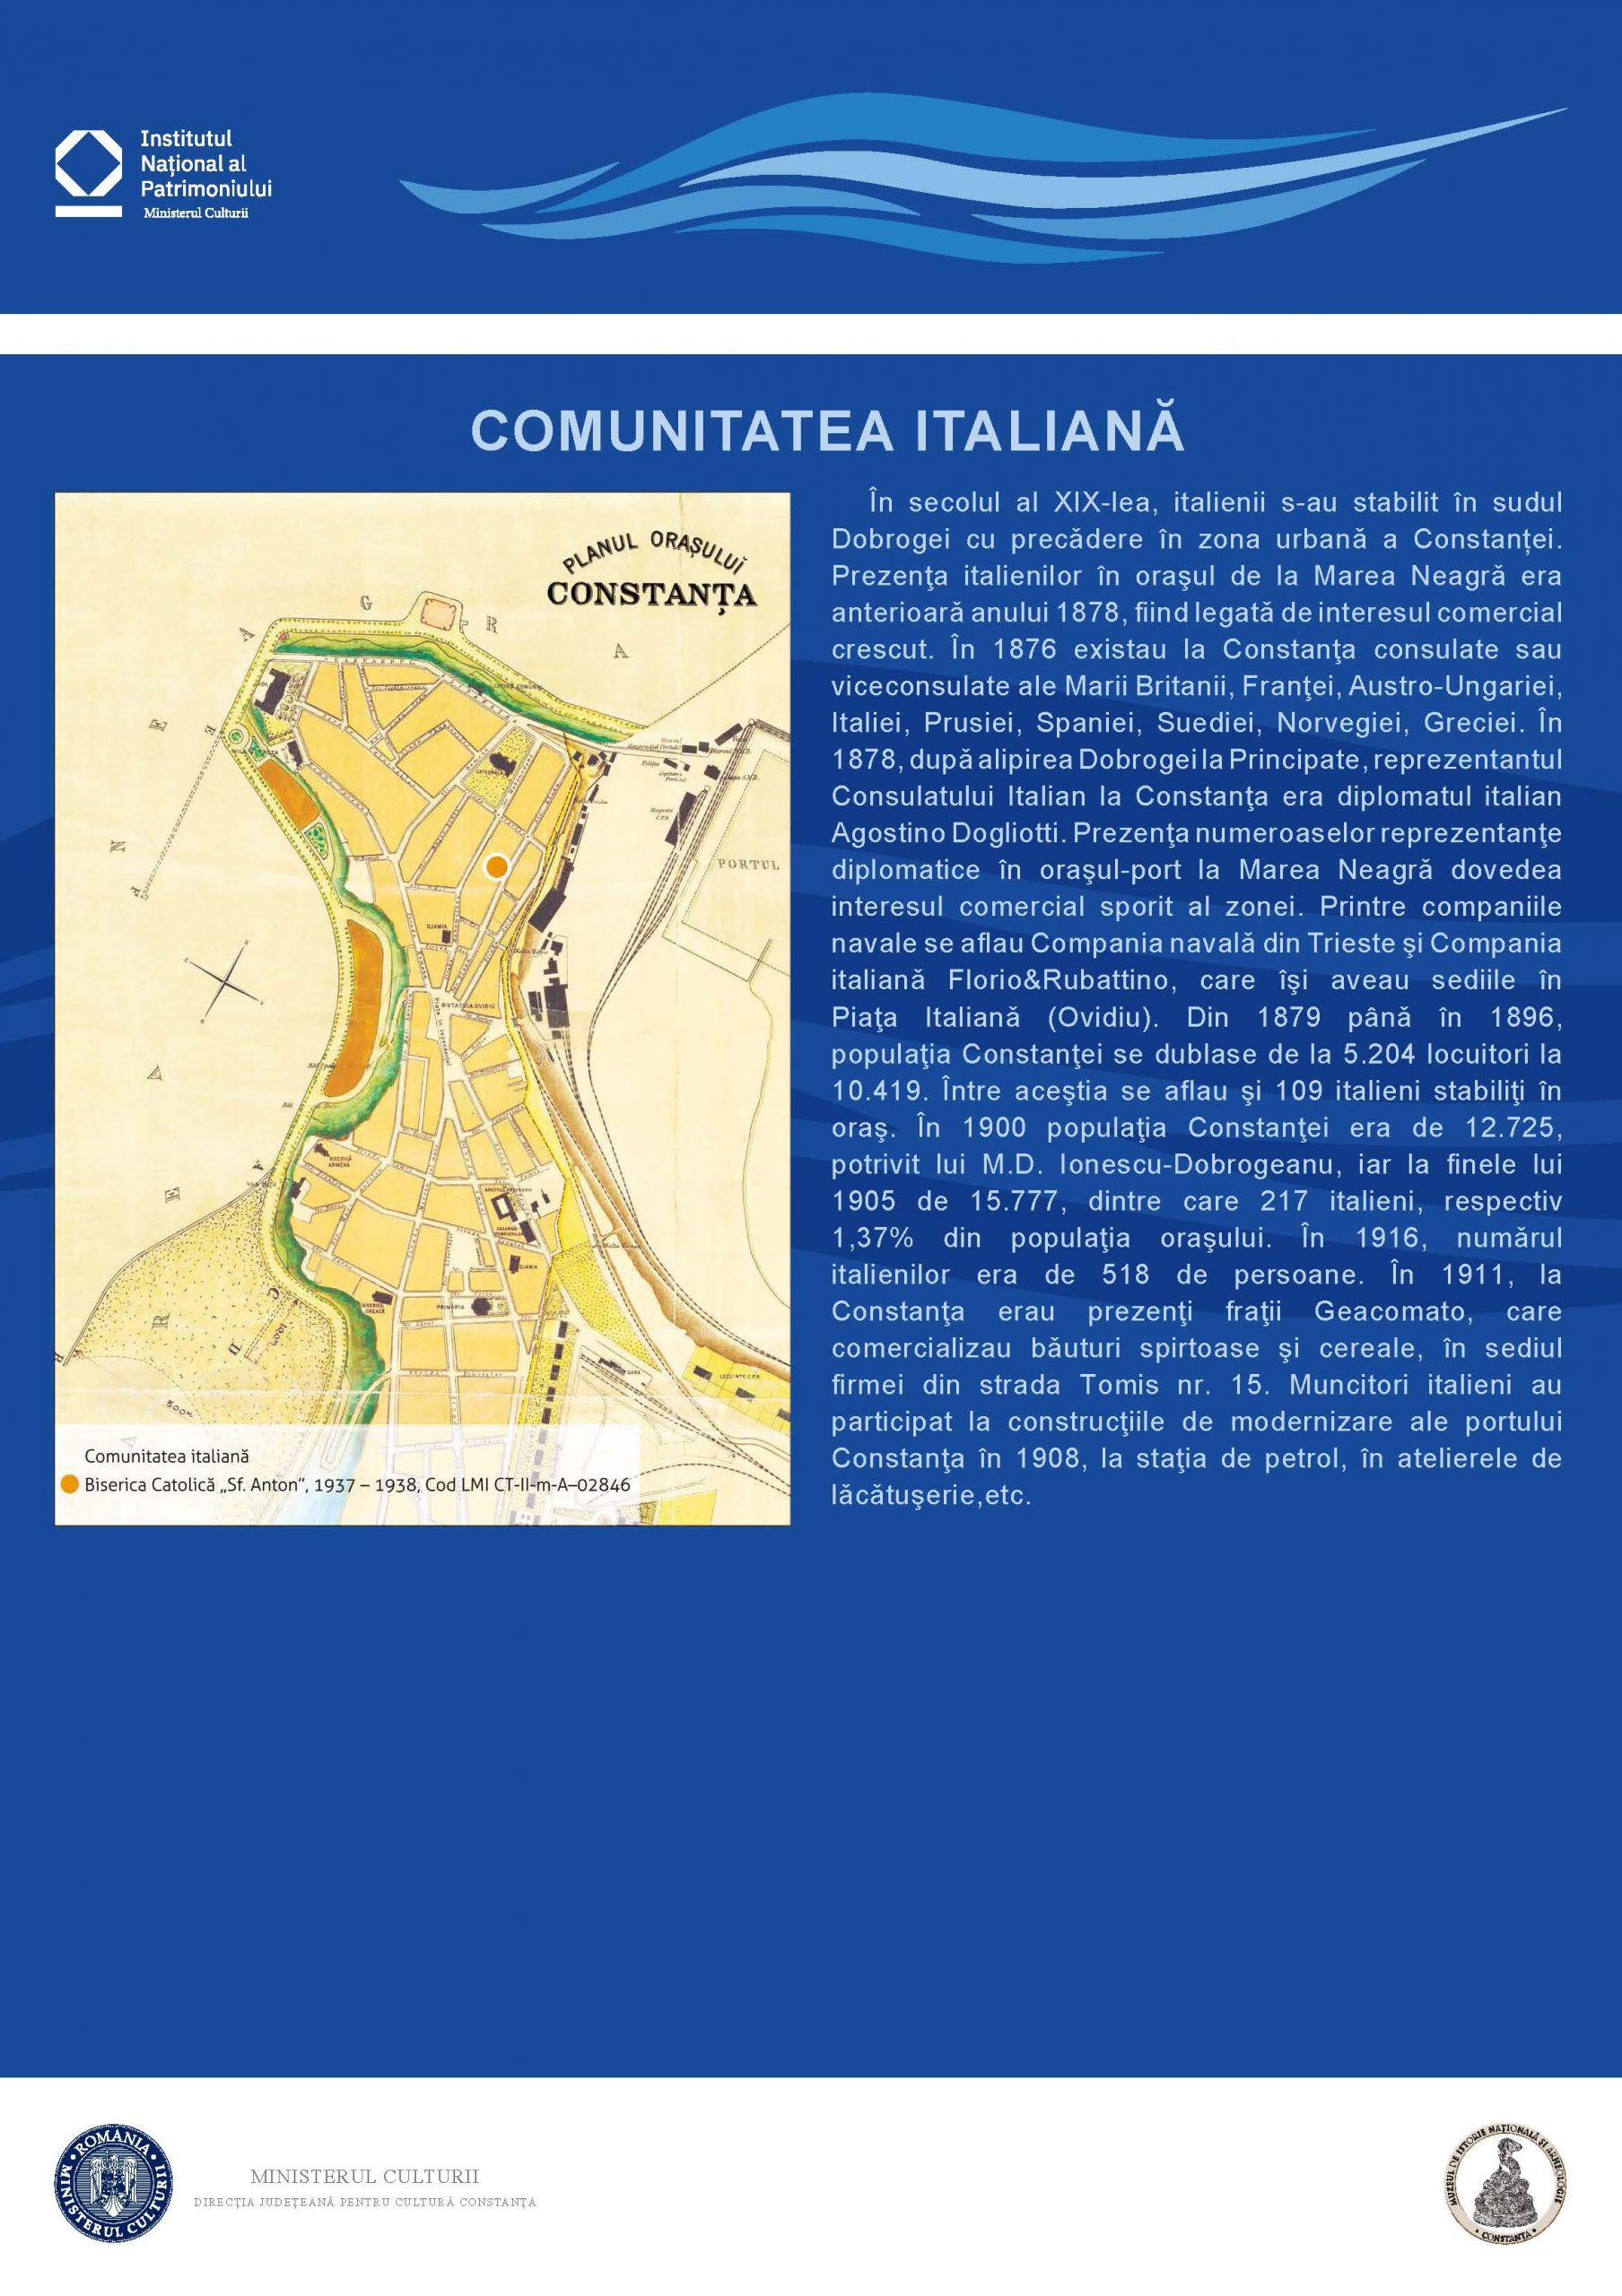 Comunitatea Italiană